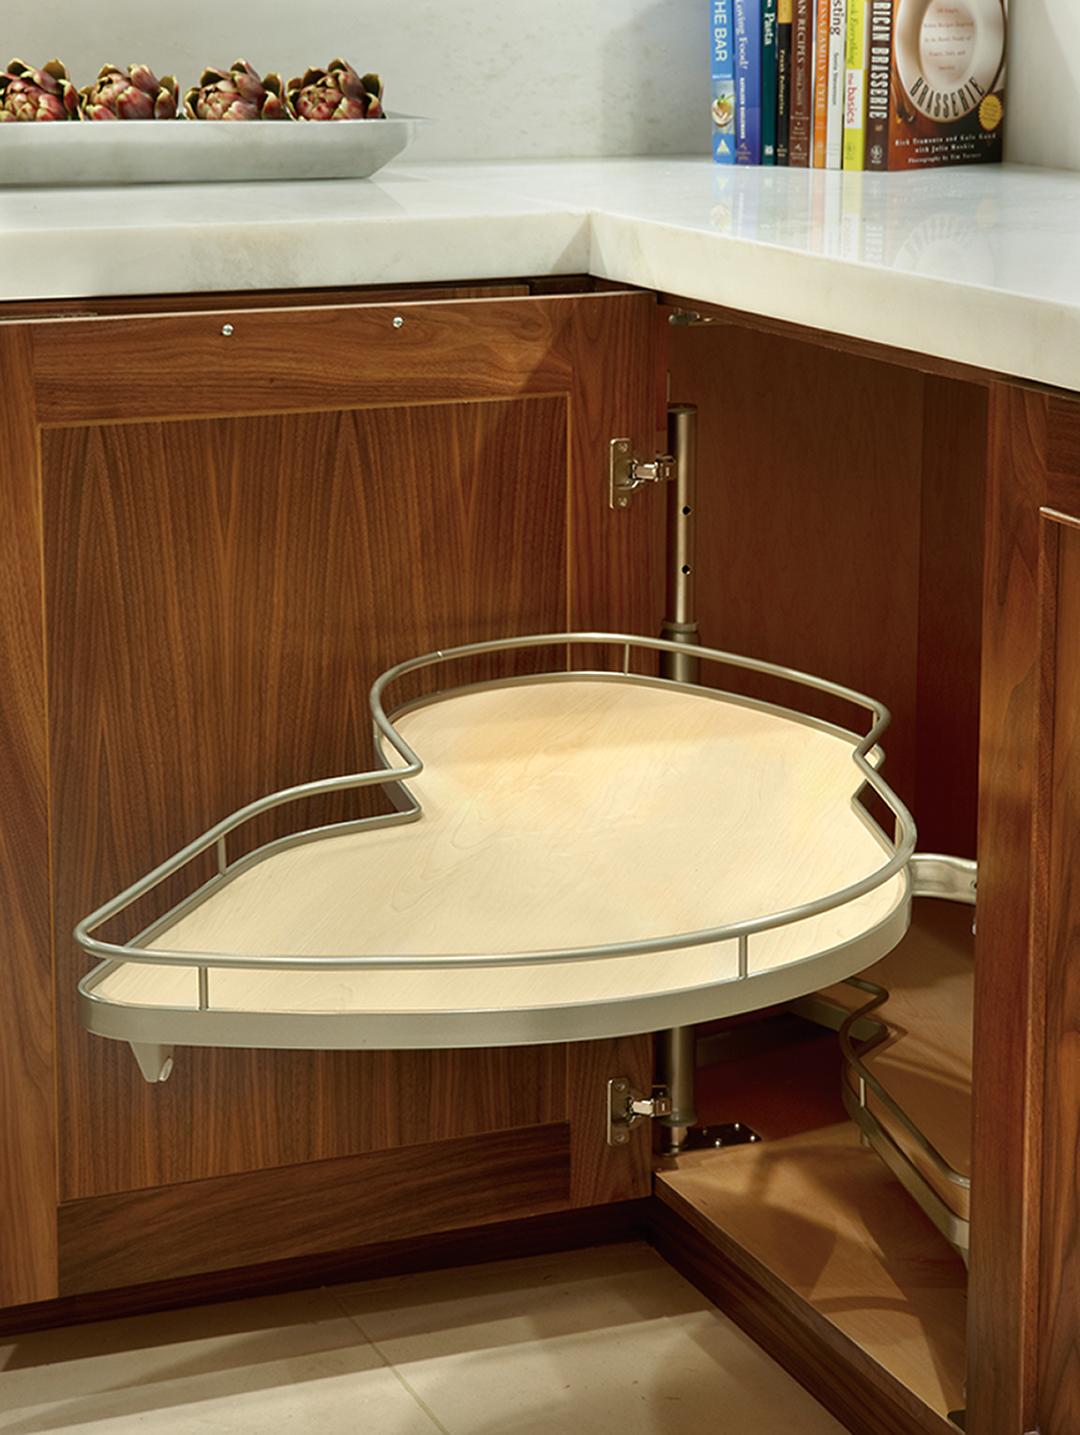 custom kitchen cabinets in walnut